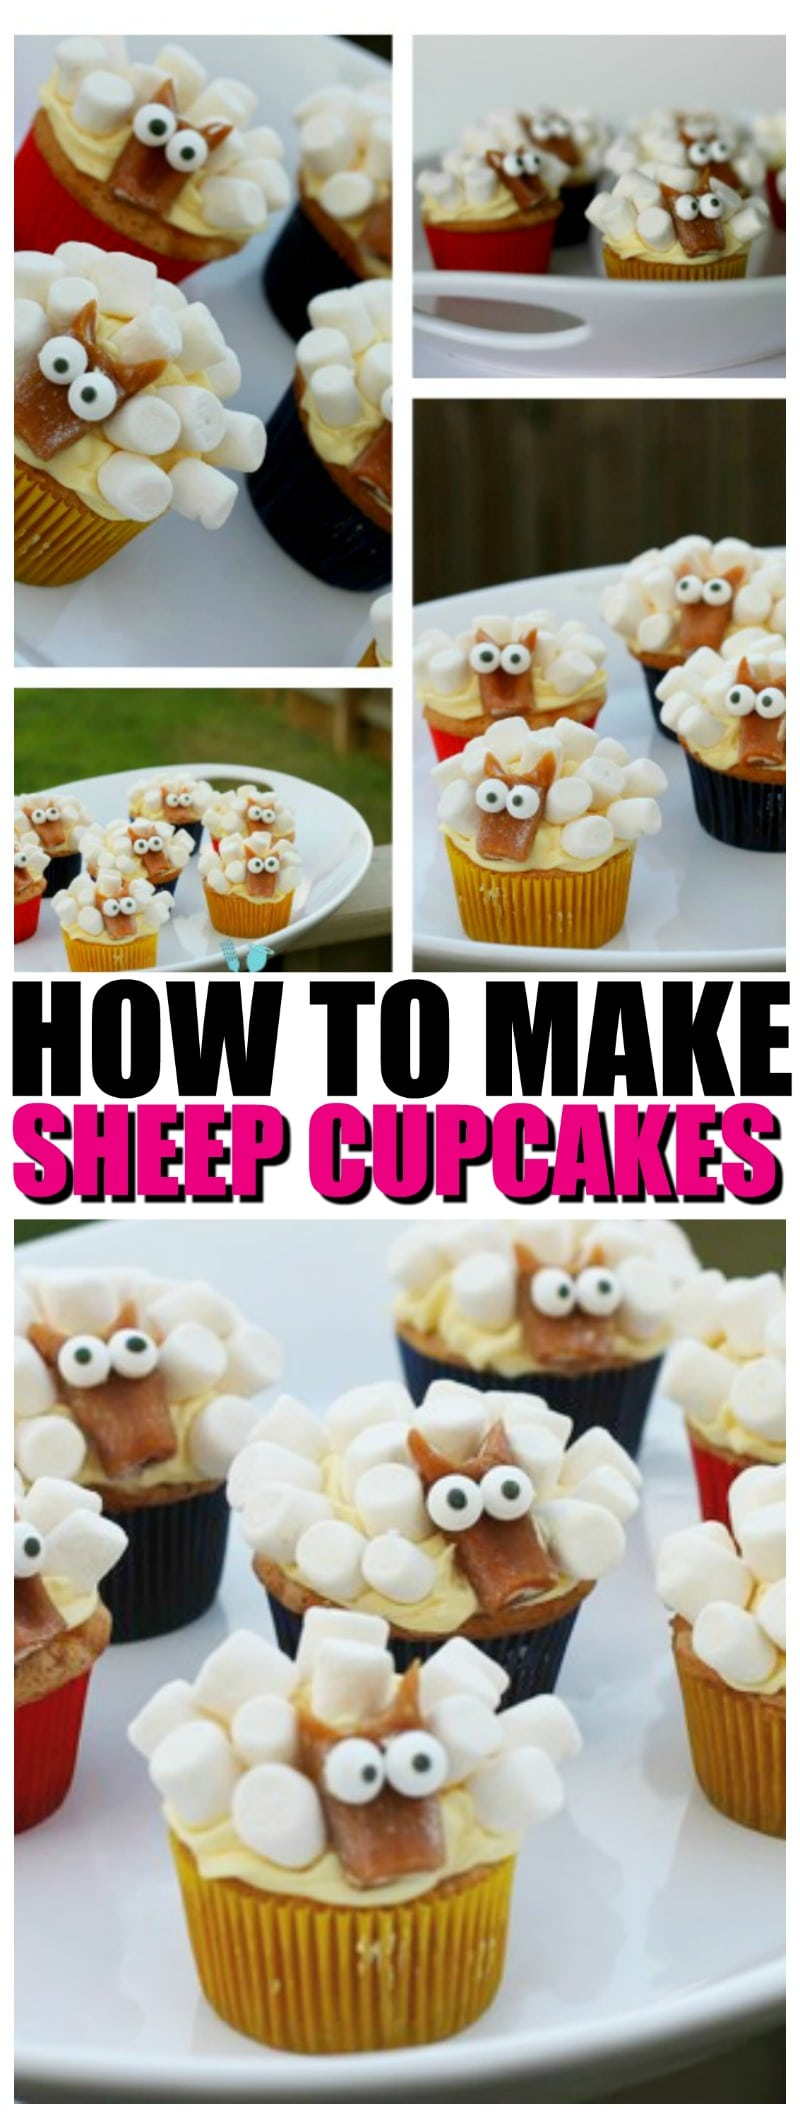 How to make Sheep Cupcakes | EASY Sheep Cupcake Tutorial with Video